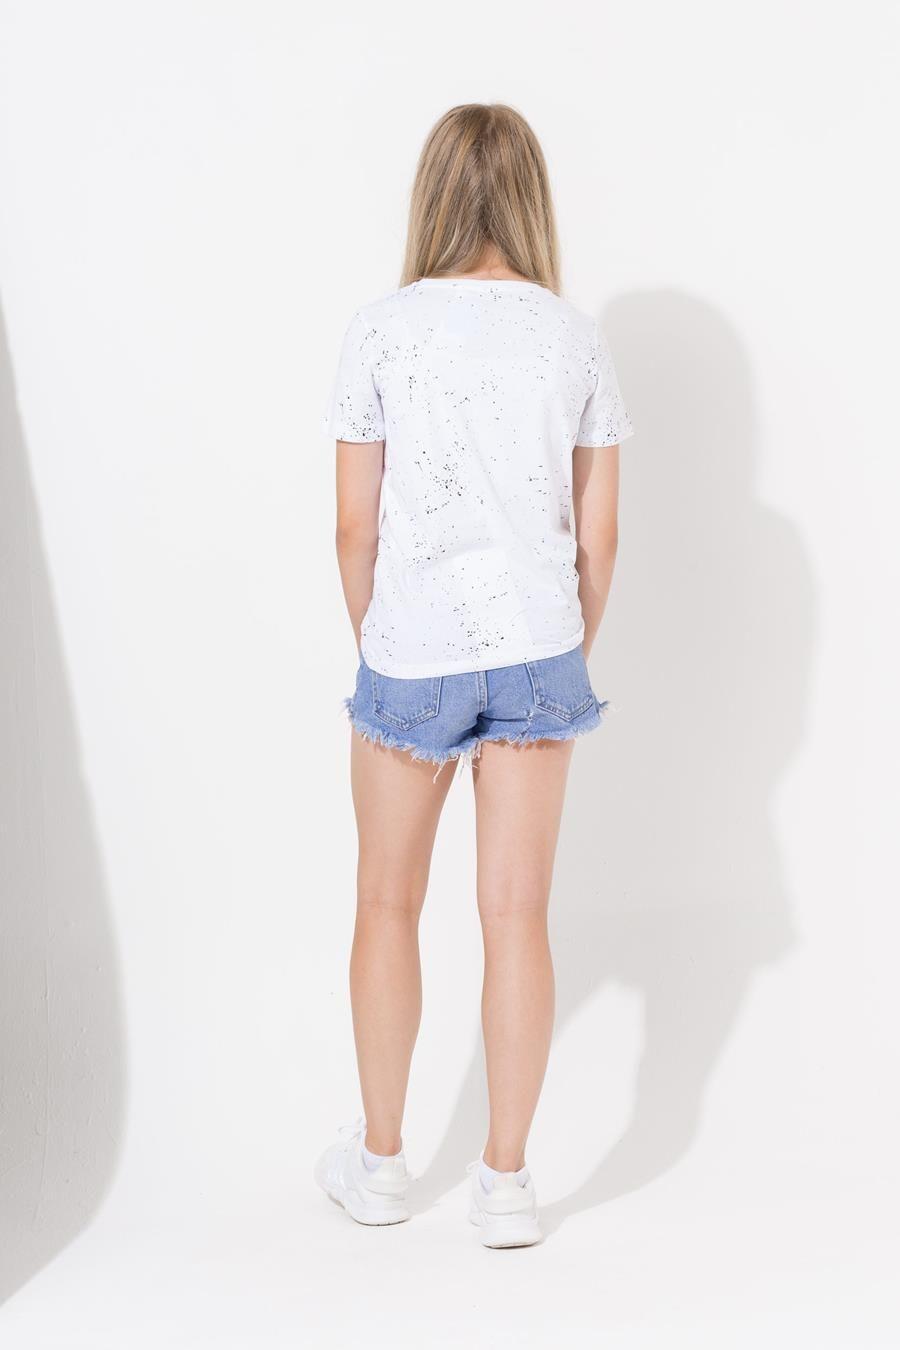 Hype White Aop Speckle Kids T-Shirt